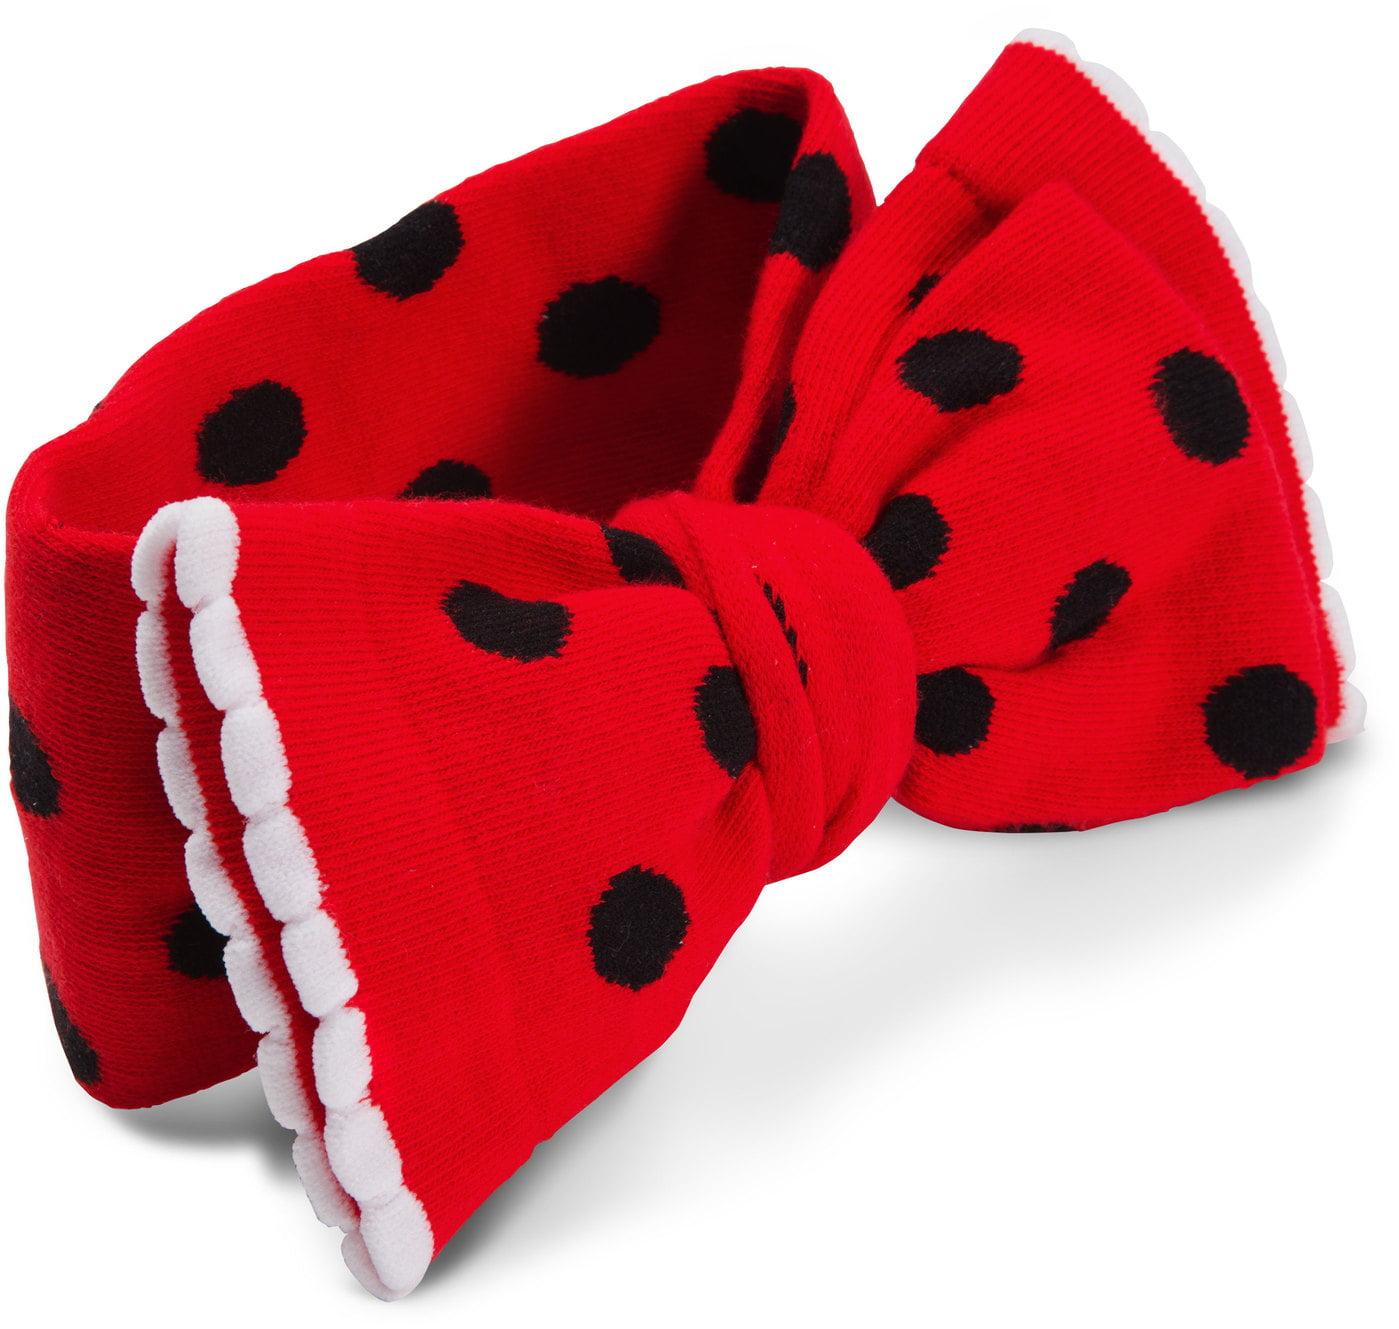 0-24 Months Hudson Baby Cotton Headbands Ladybug